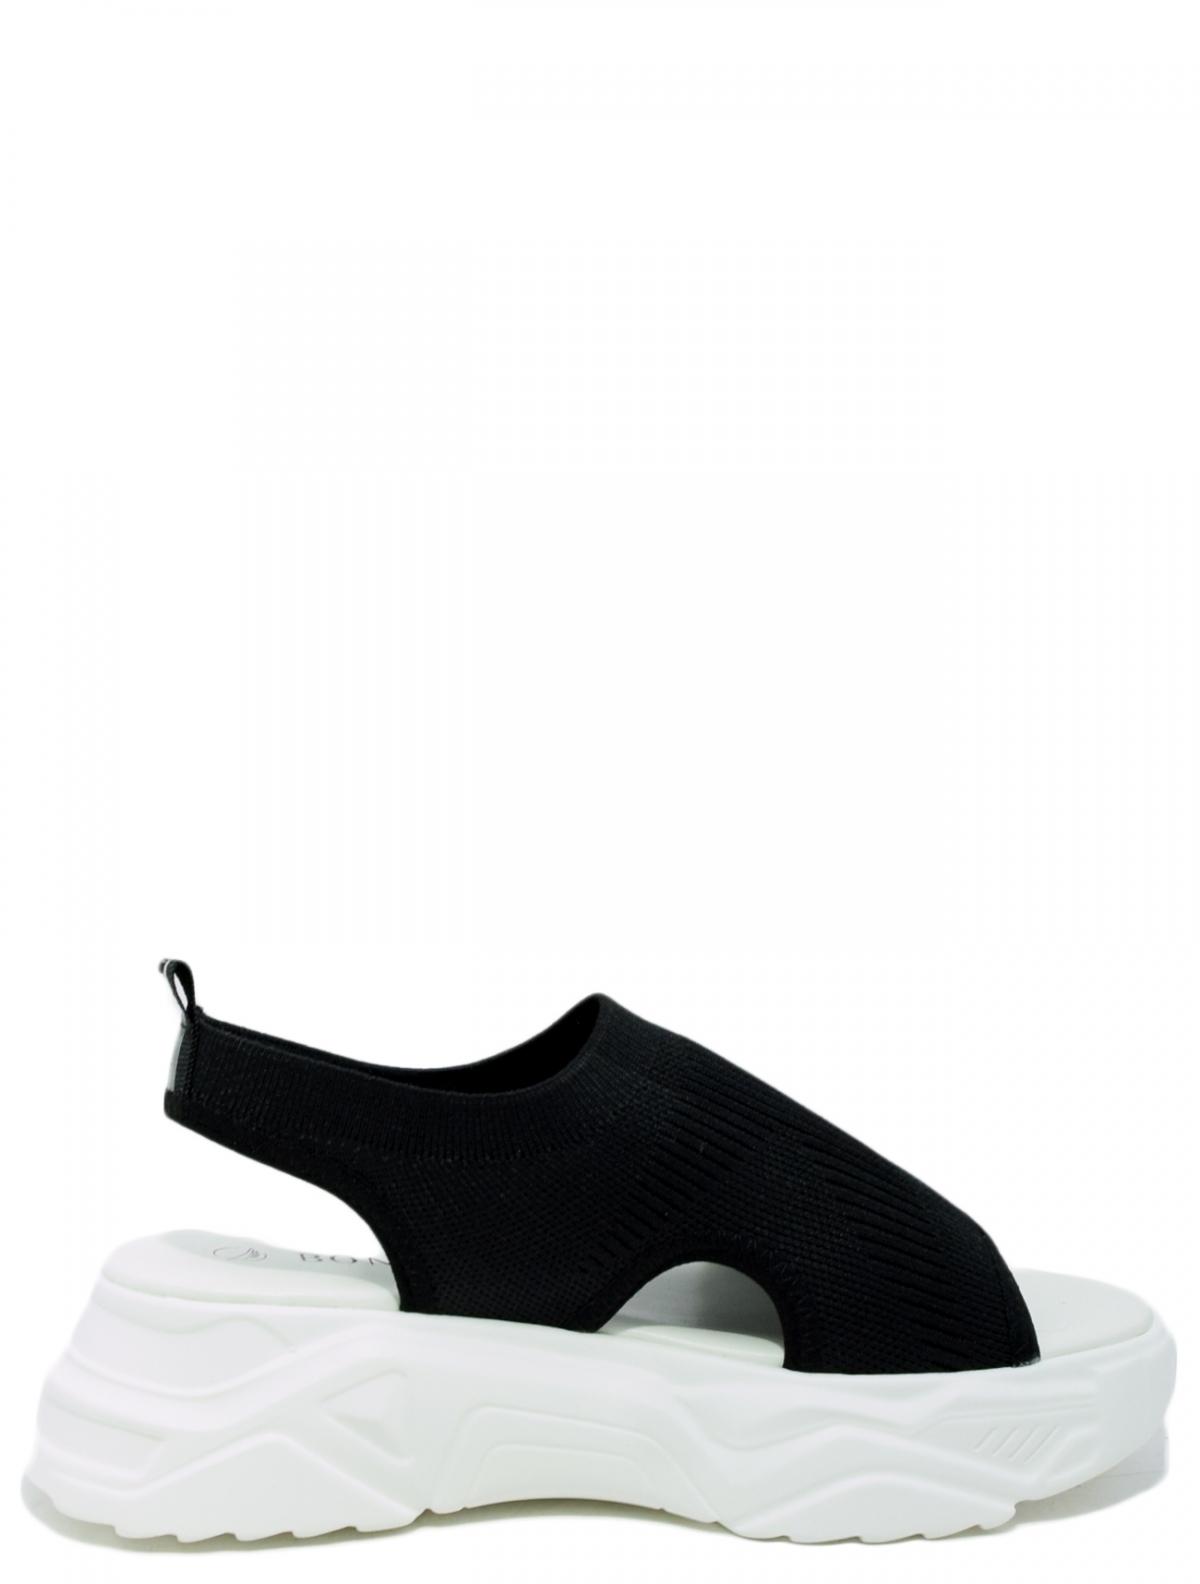 Bonavi 2W26-18-101 женские сандали